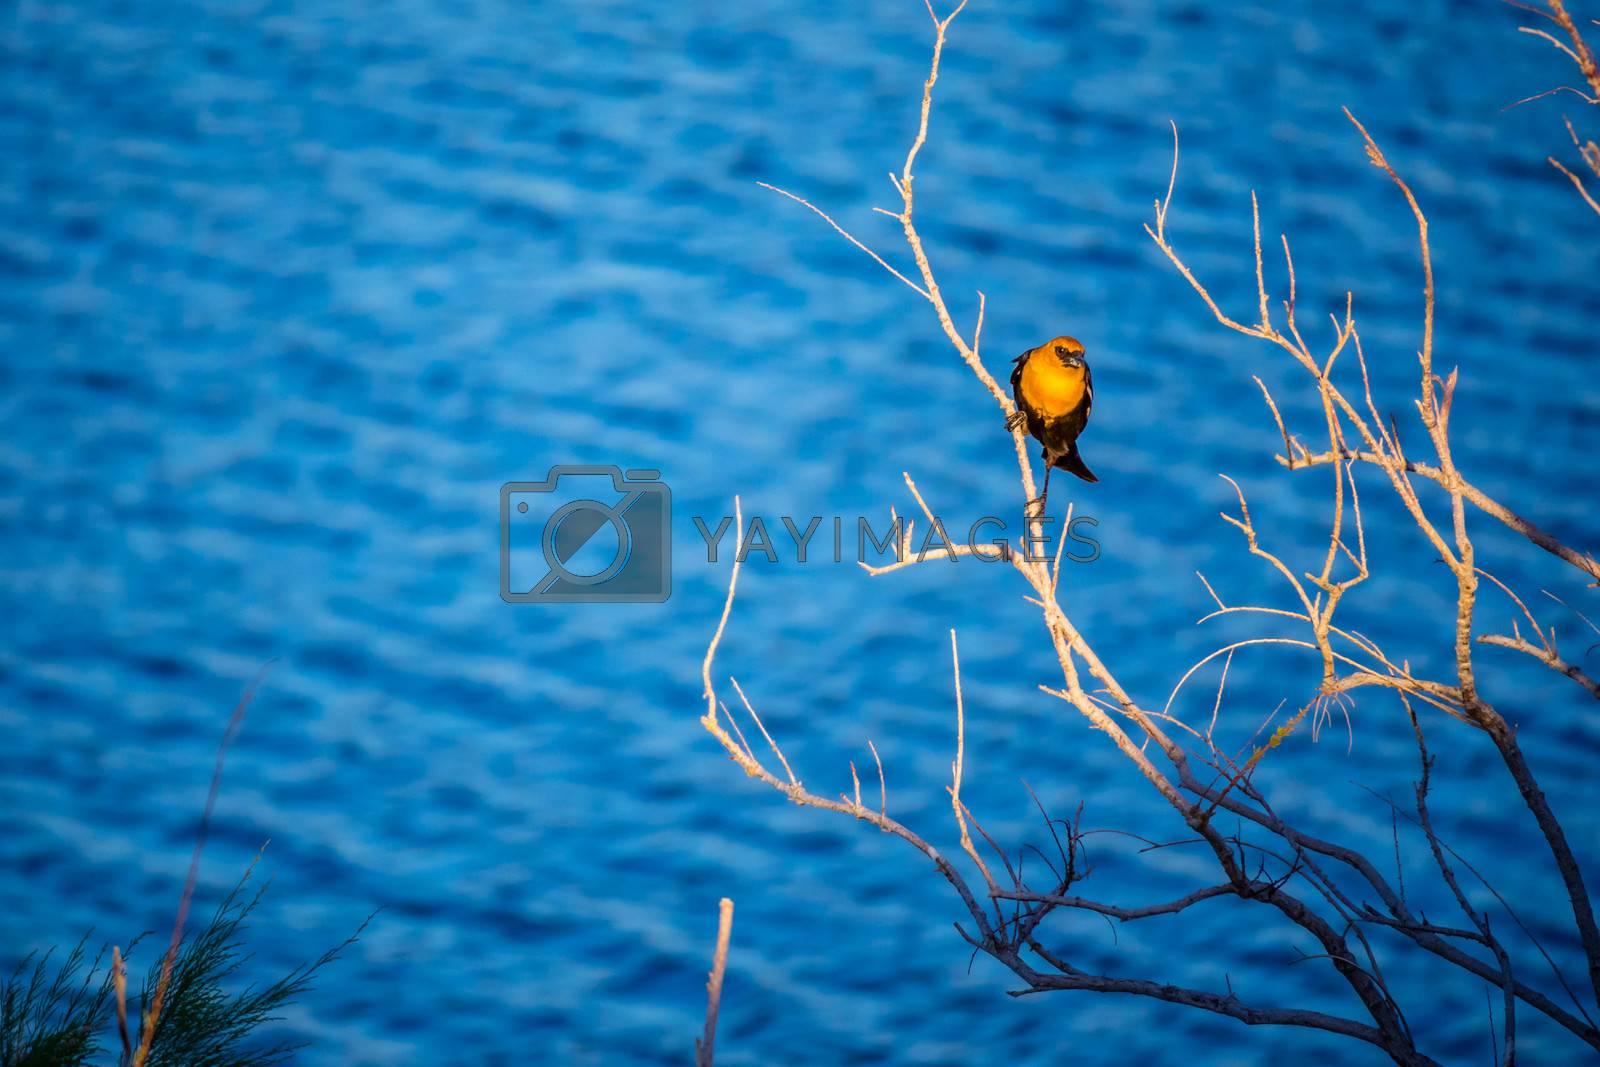 A Yellow Headed Blackbird in Yuma, Arizona by Cheri Alguire